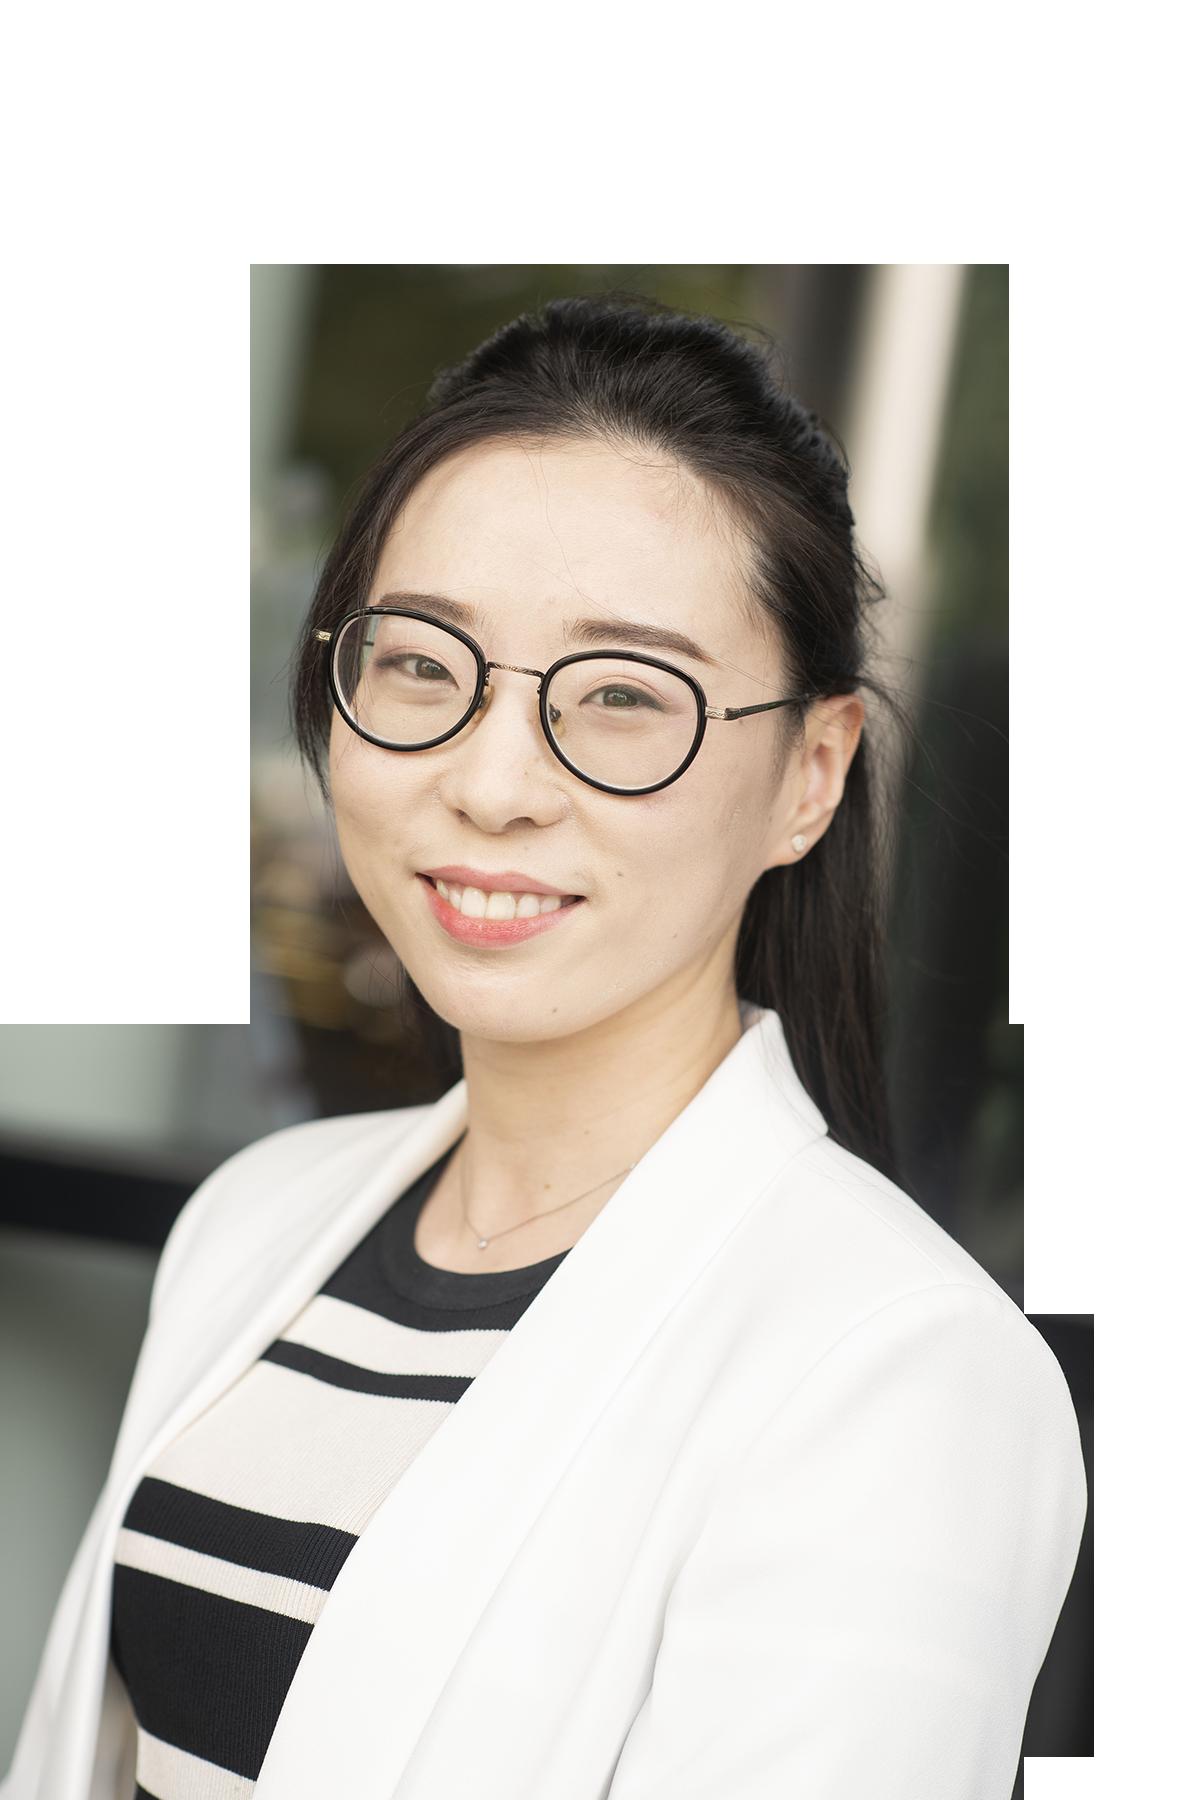 Dr. Liuying Li